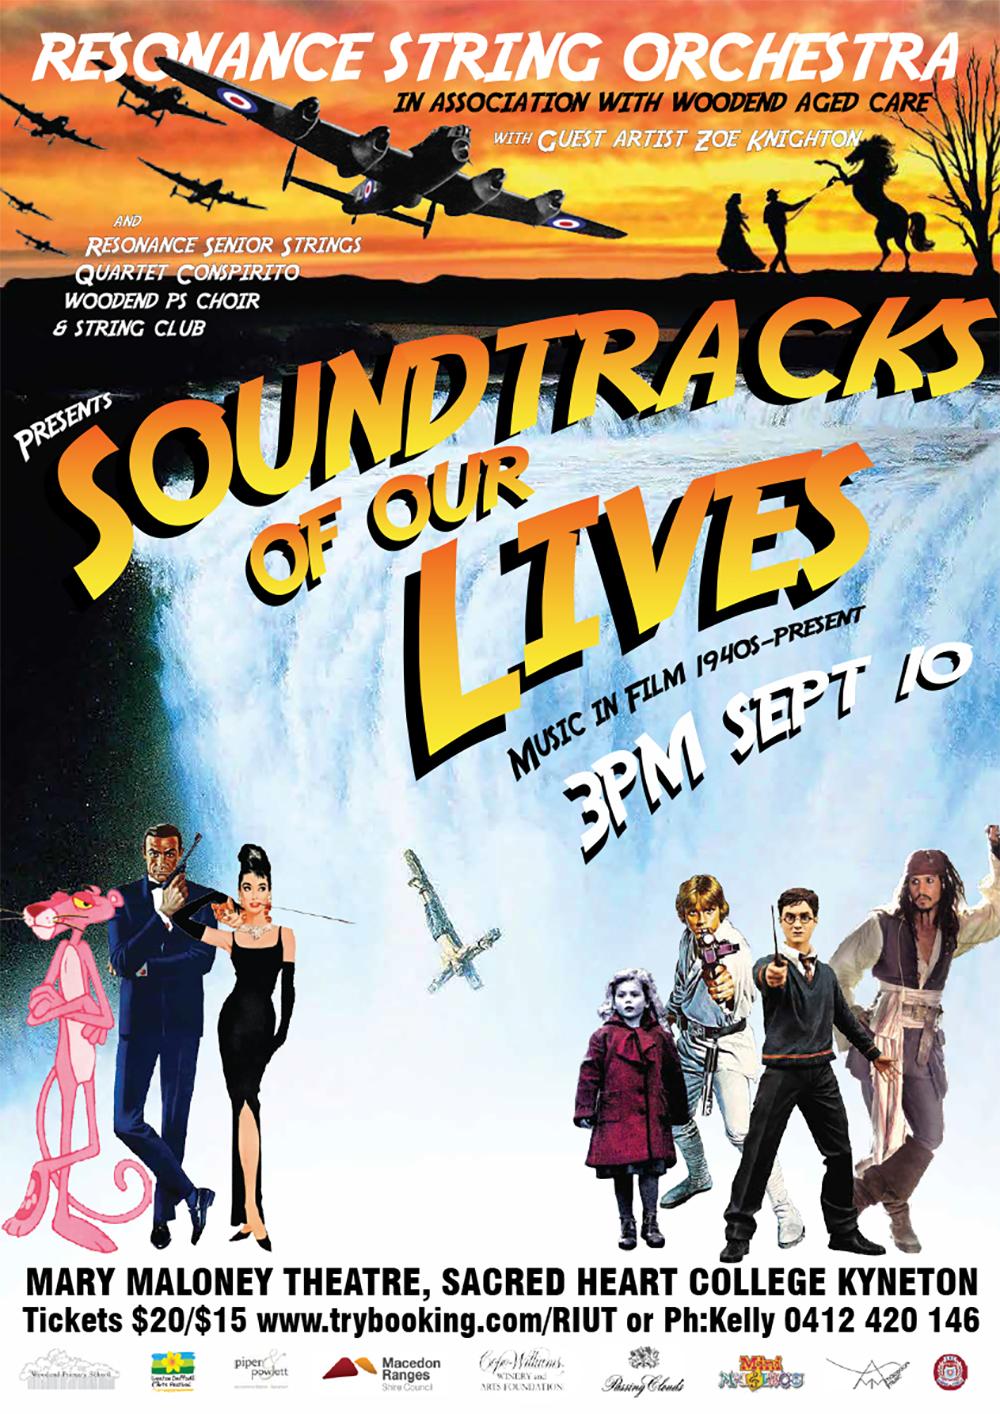 Soundtrackss Of Our Lives poster V2 copy.jpg